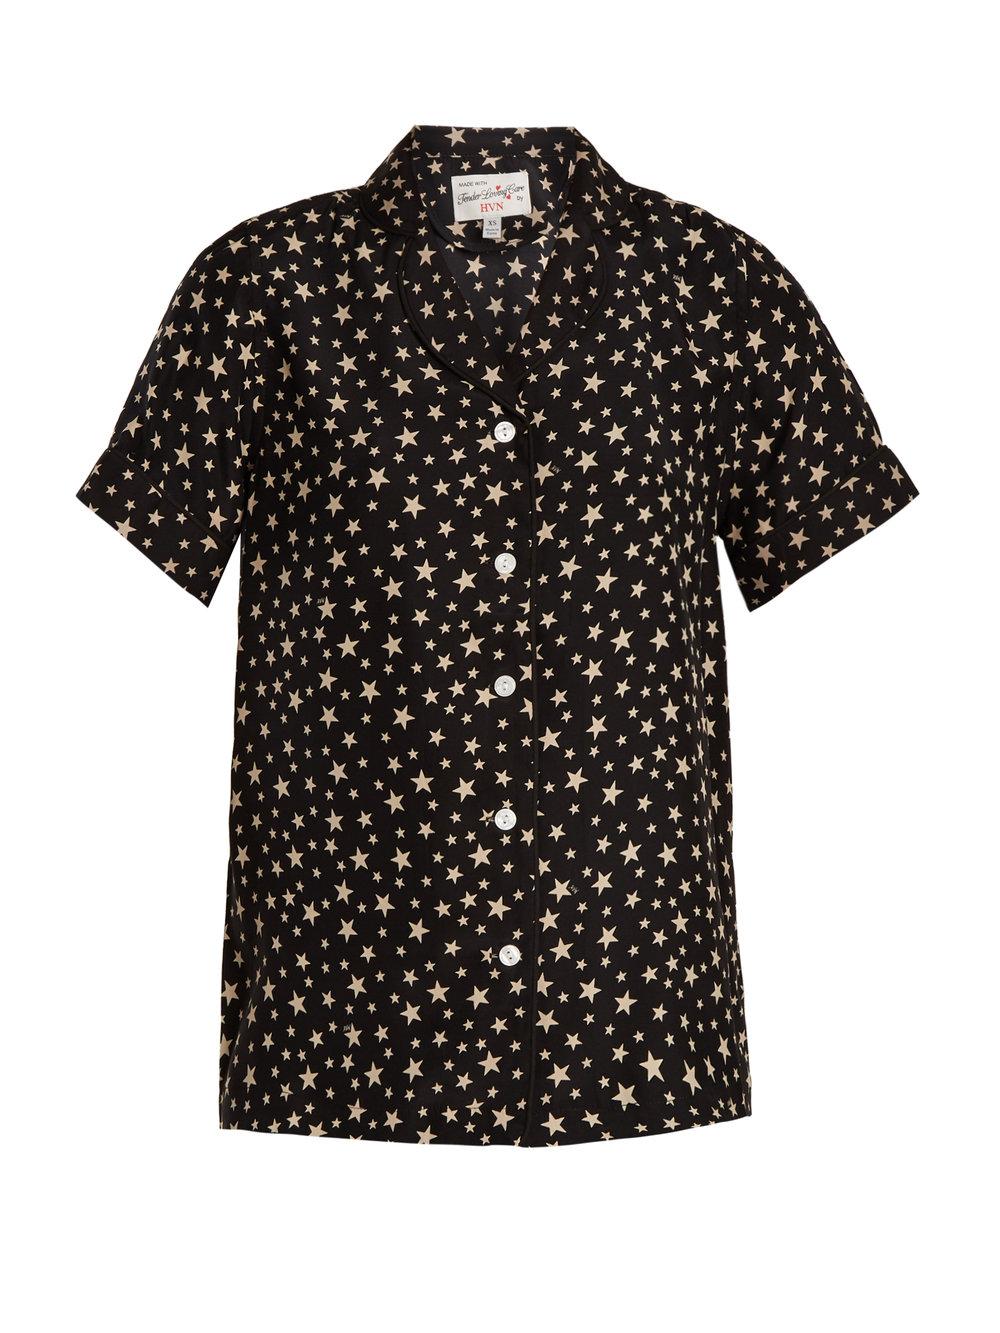 BLACK STAR - SHOP NOW